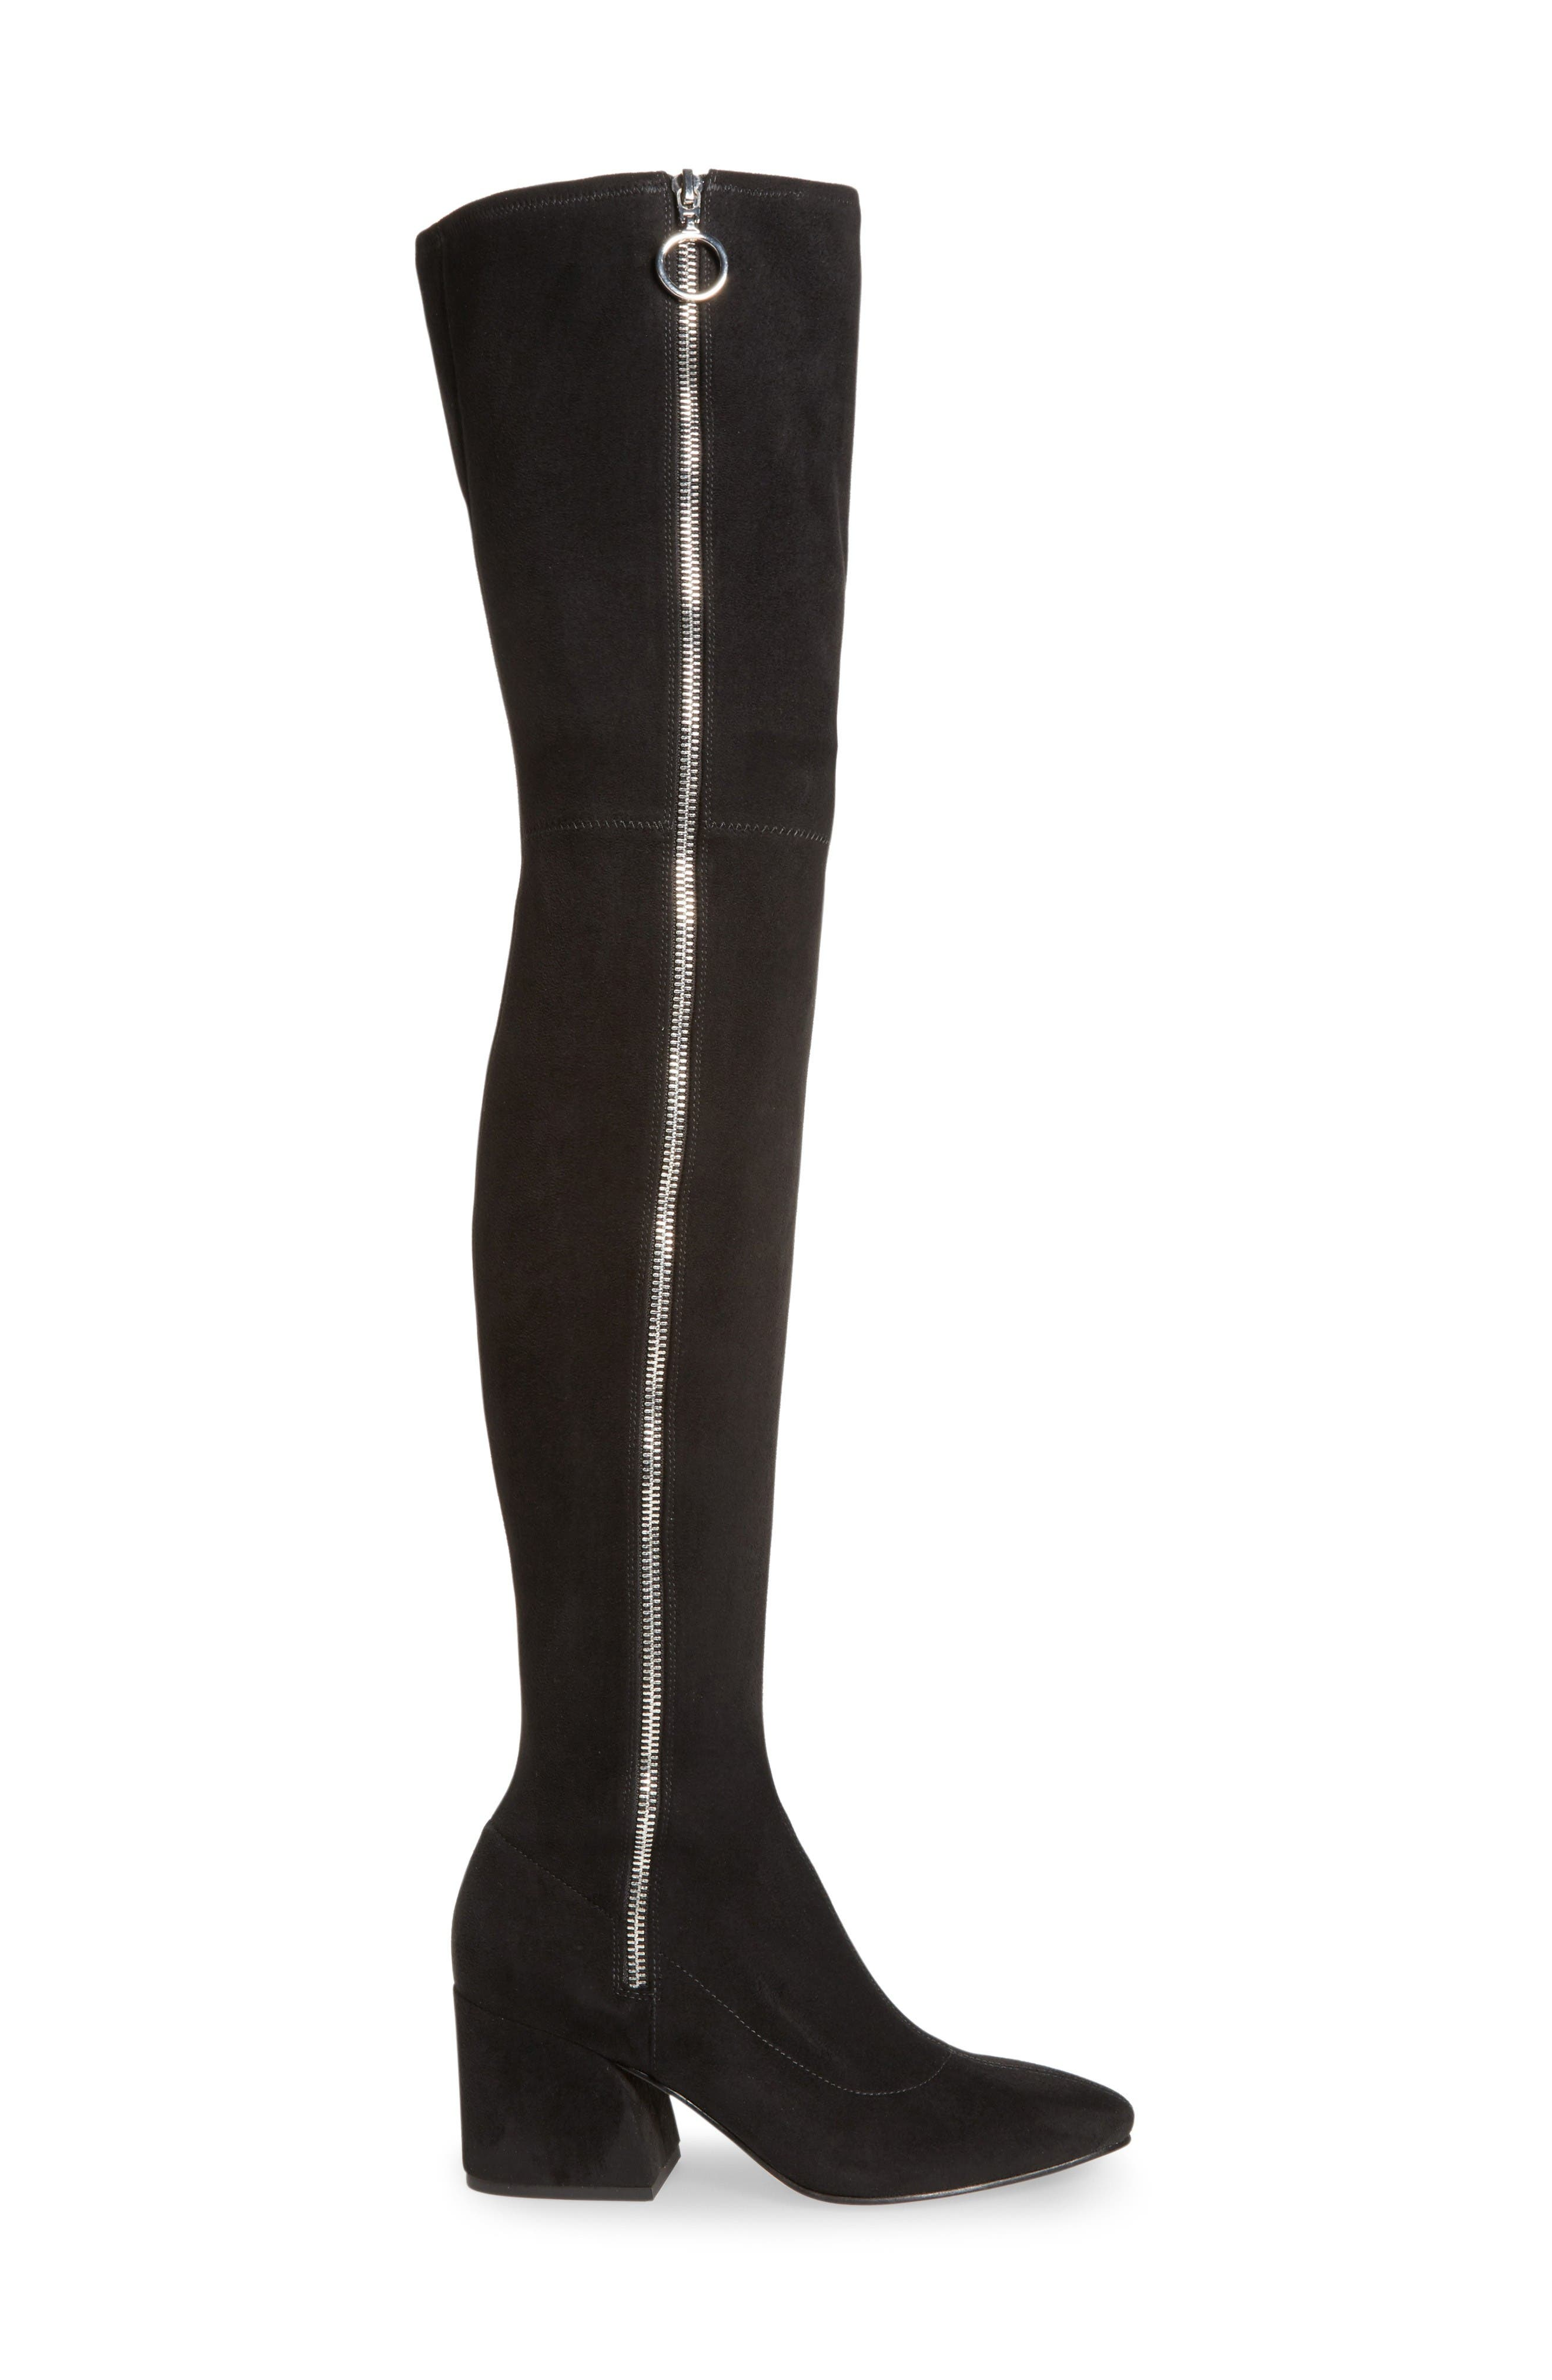 Vix Thigh High Boot,                             Alternate thumbnail 3, color,                             Black Suede